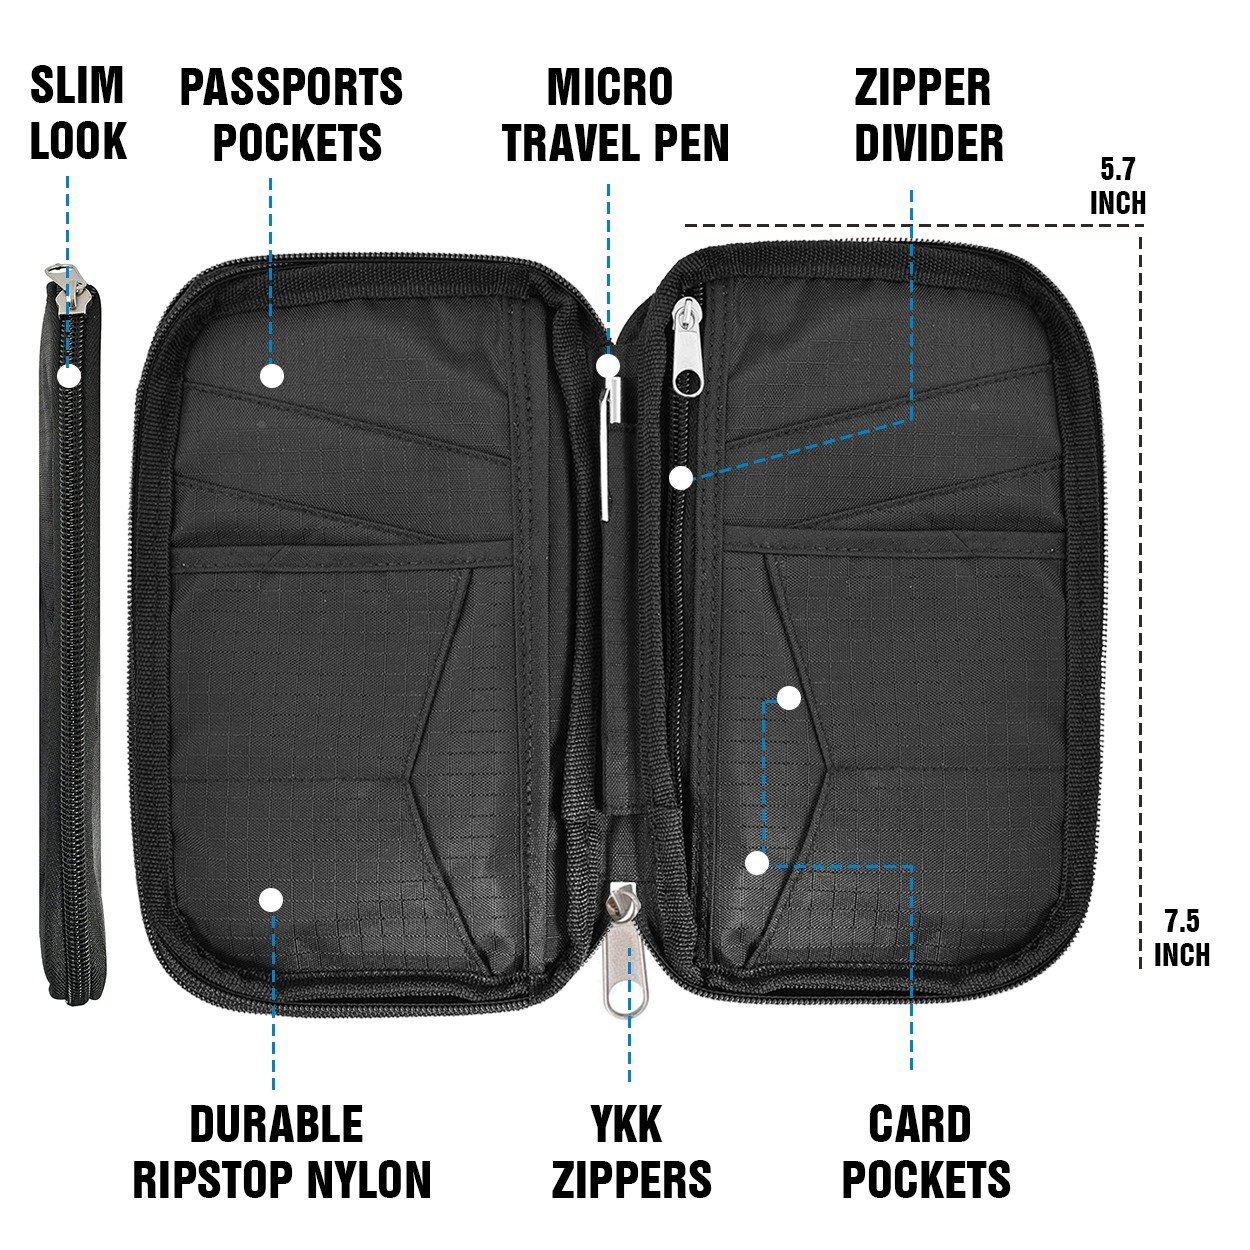 Black Travel Wallet /& Family Passport Holder RFID Blocking Document Holder /& Organizer Protects Your Passports